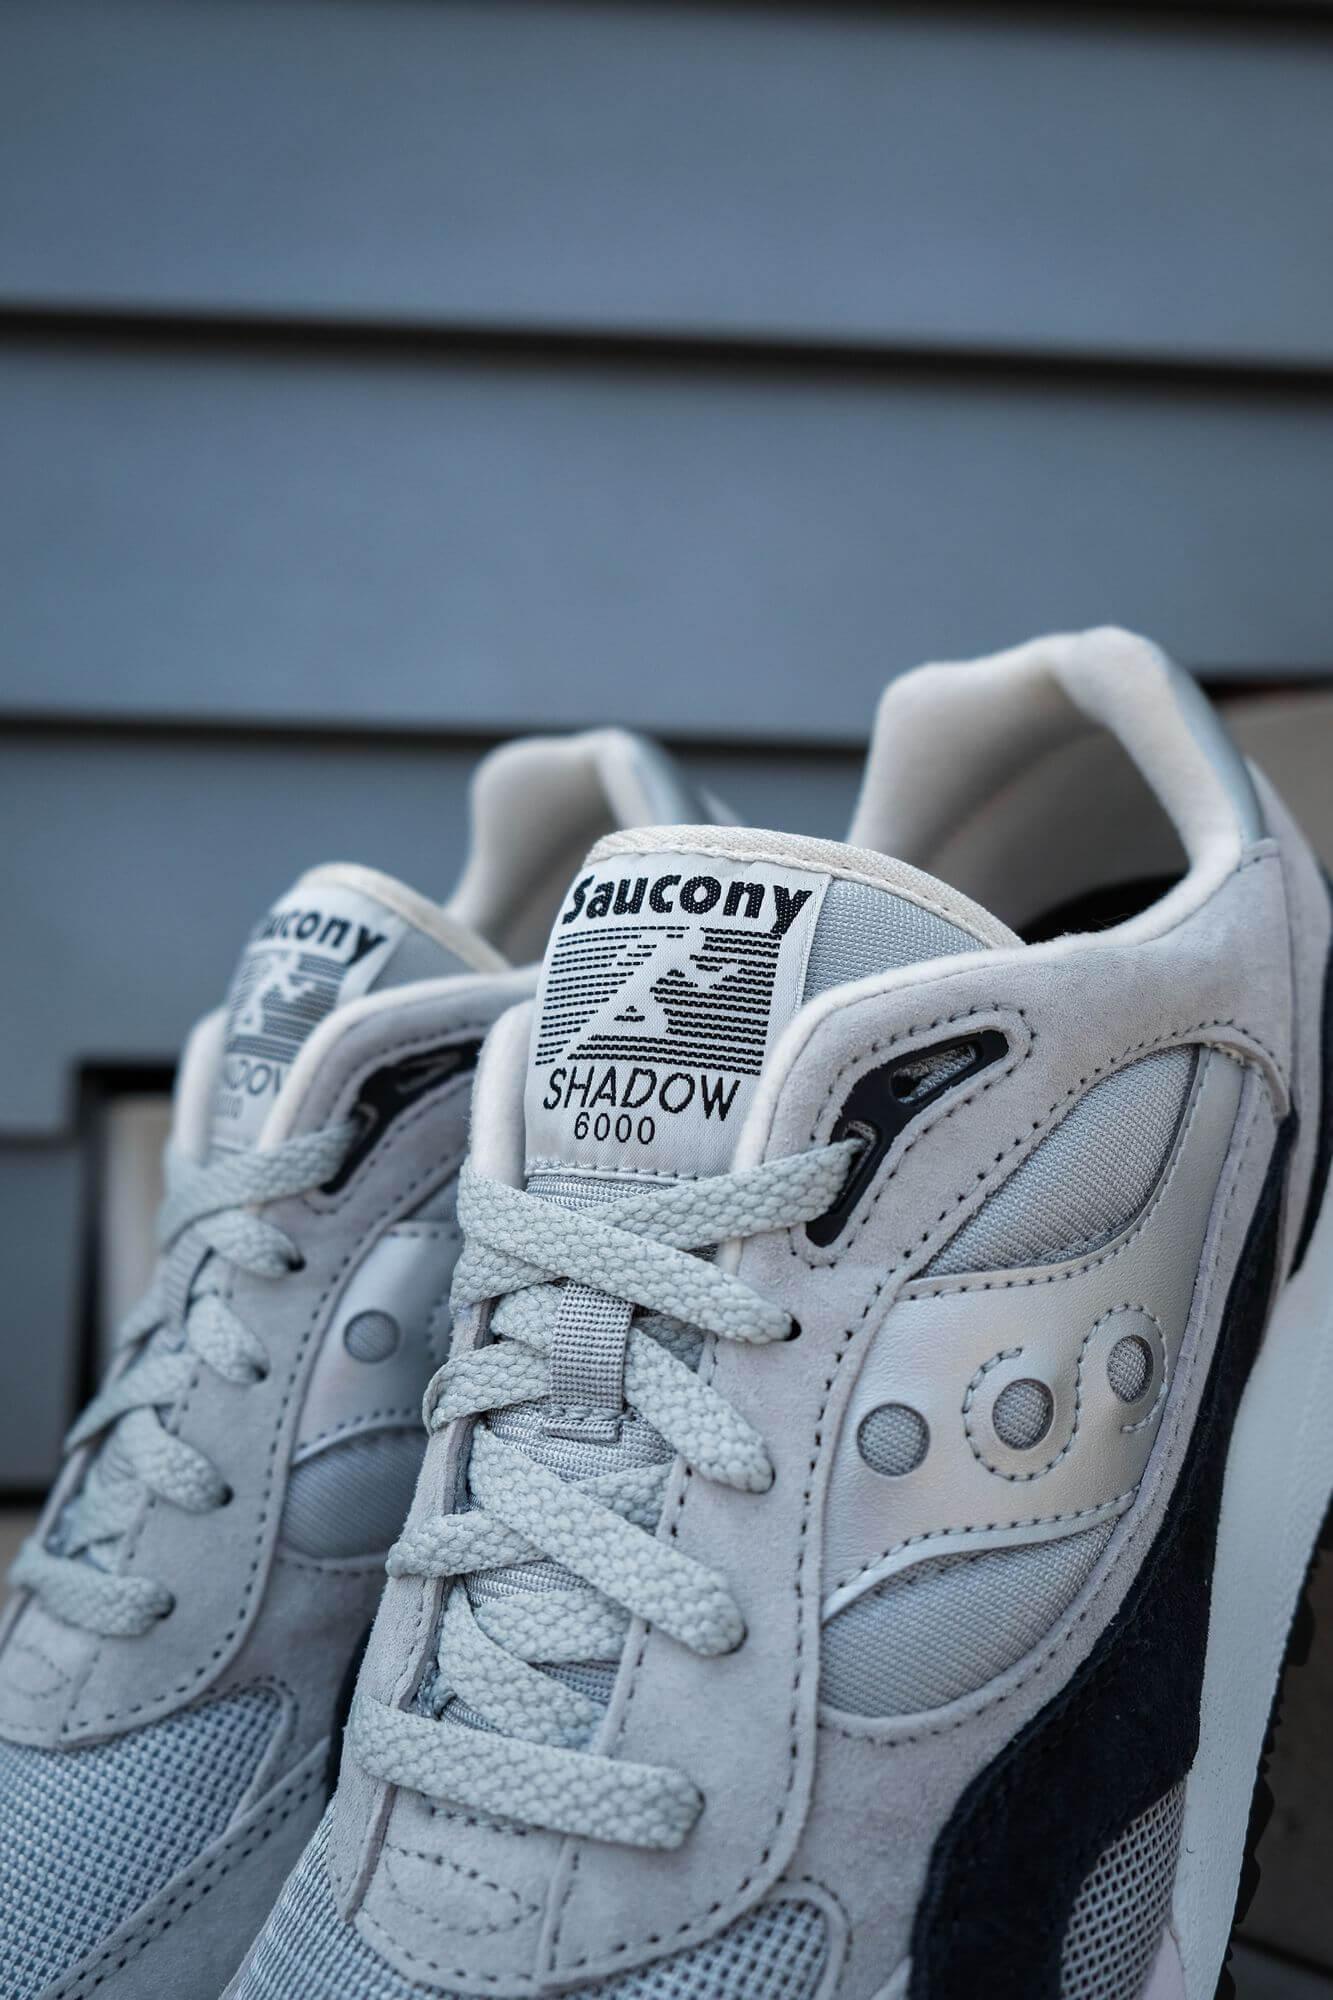 tongue details - Saucony Originals Shadow 6000 - silver/grey - S70441-7